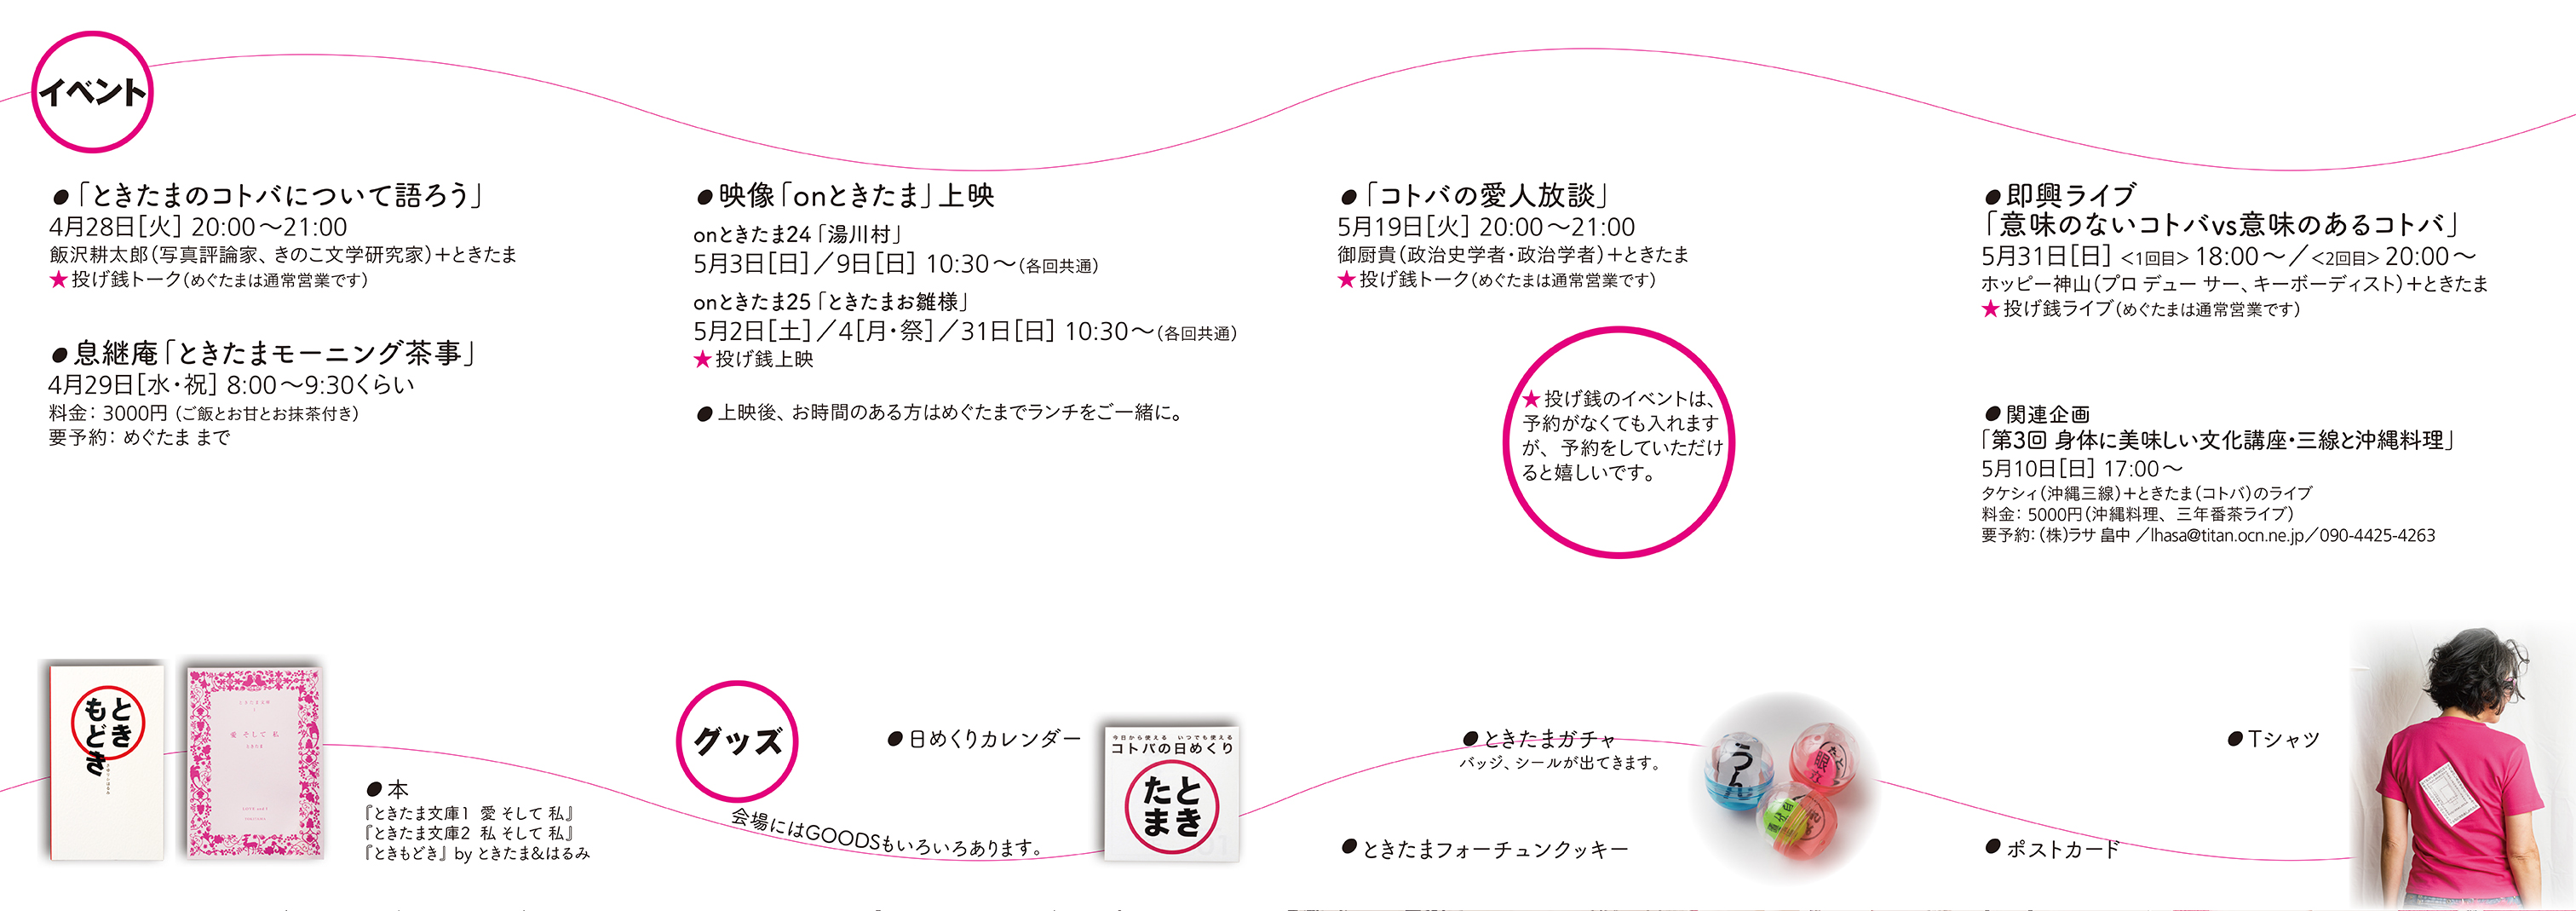 Tokitama_flyer_omote2_B